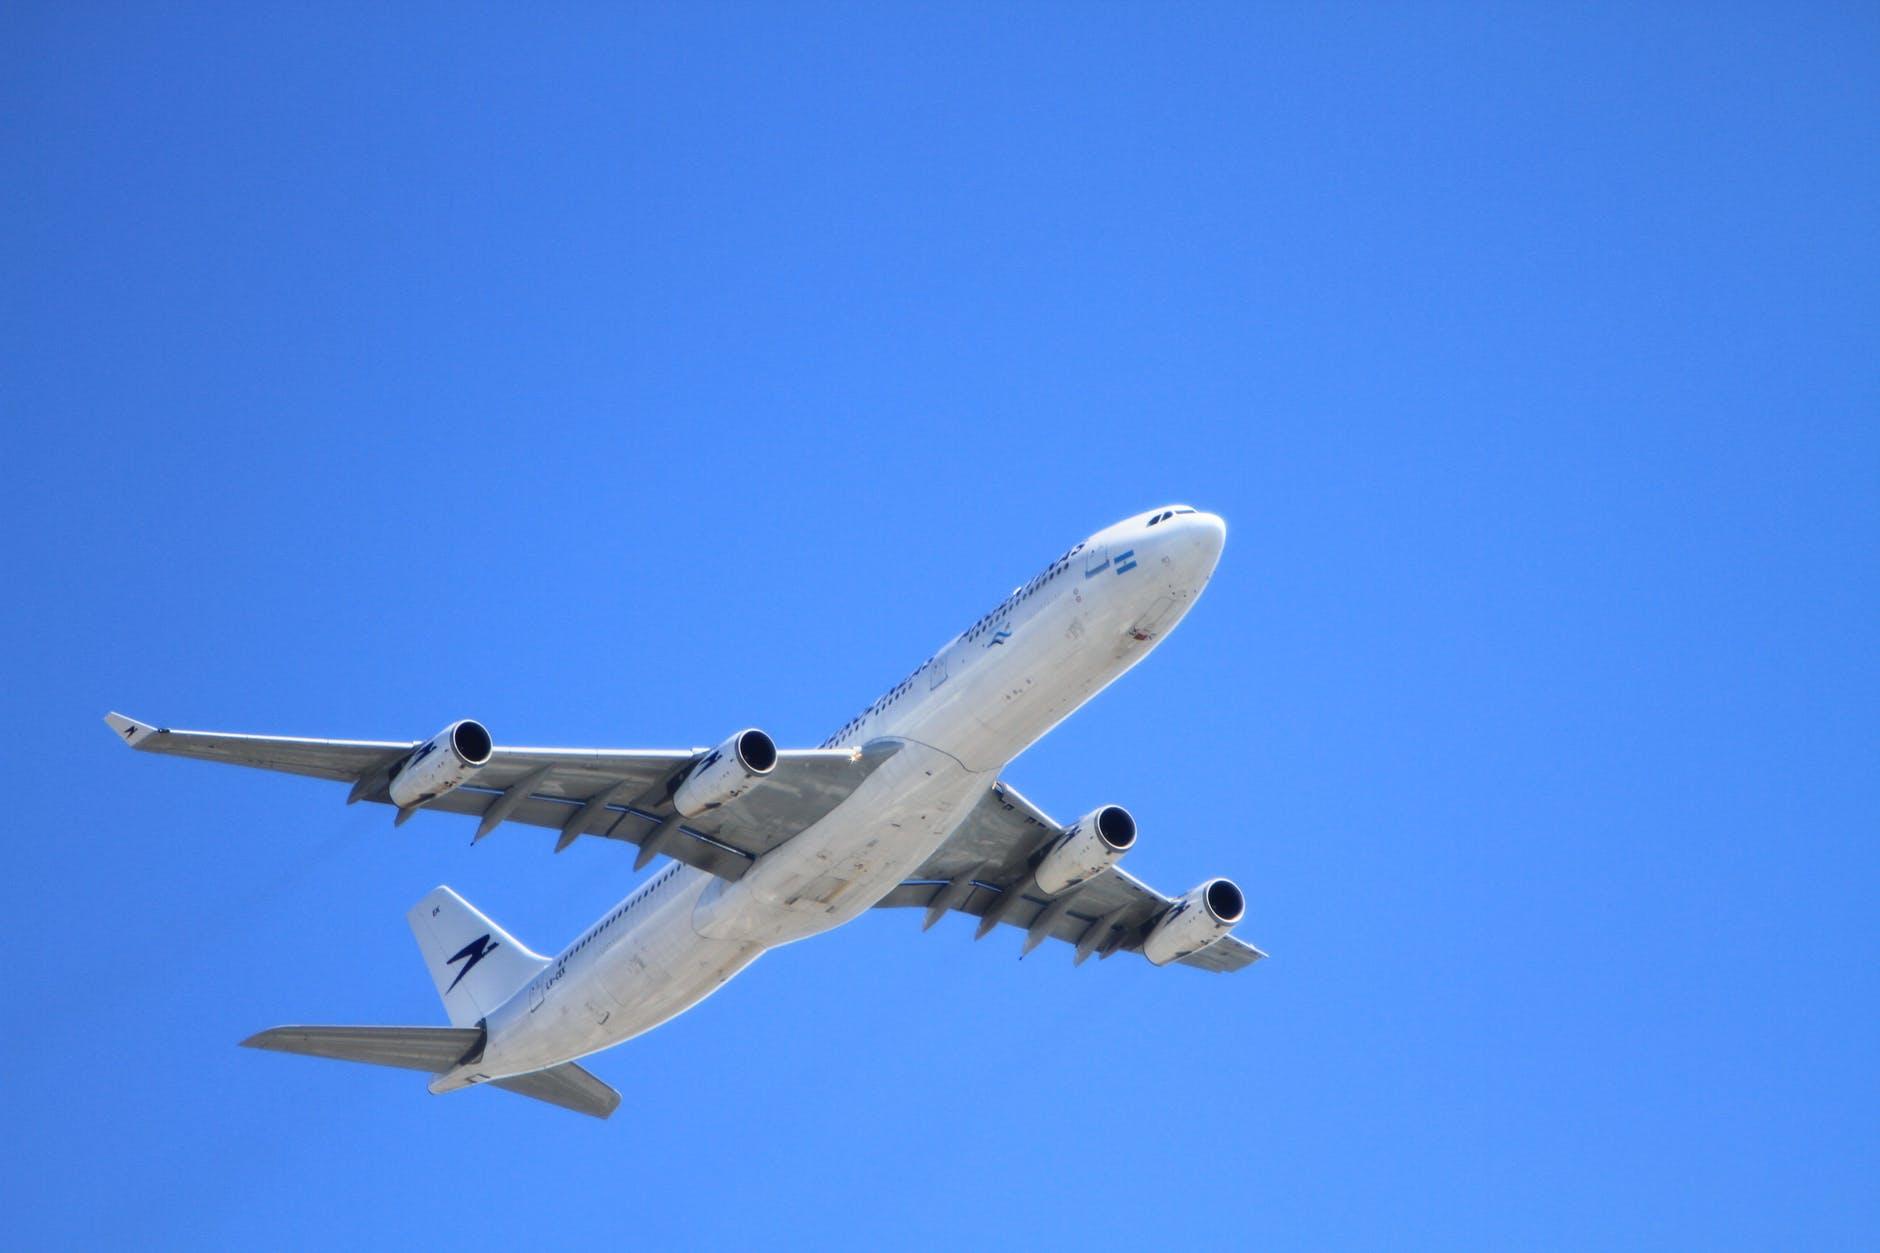 8 Cara Mendapatkan Tiket Pesawat Promo dengan Harga Murah